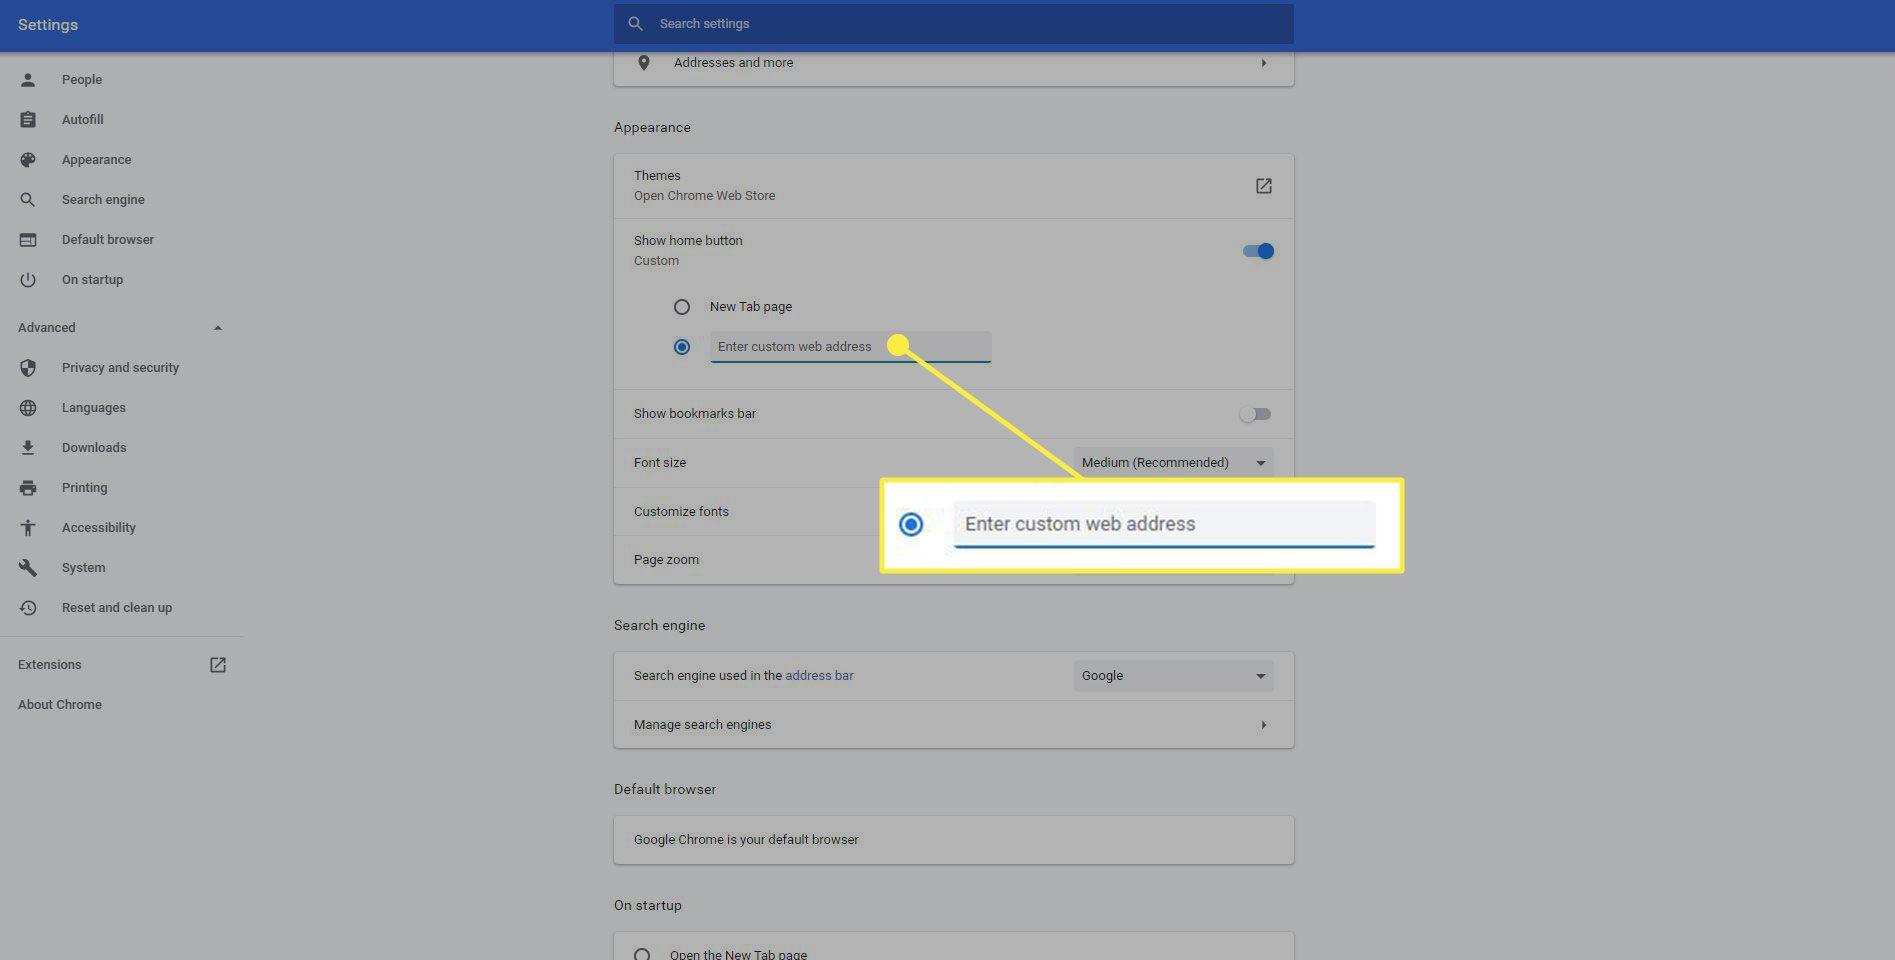 The Enter Custom Web Address option